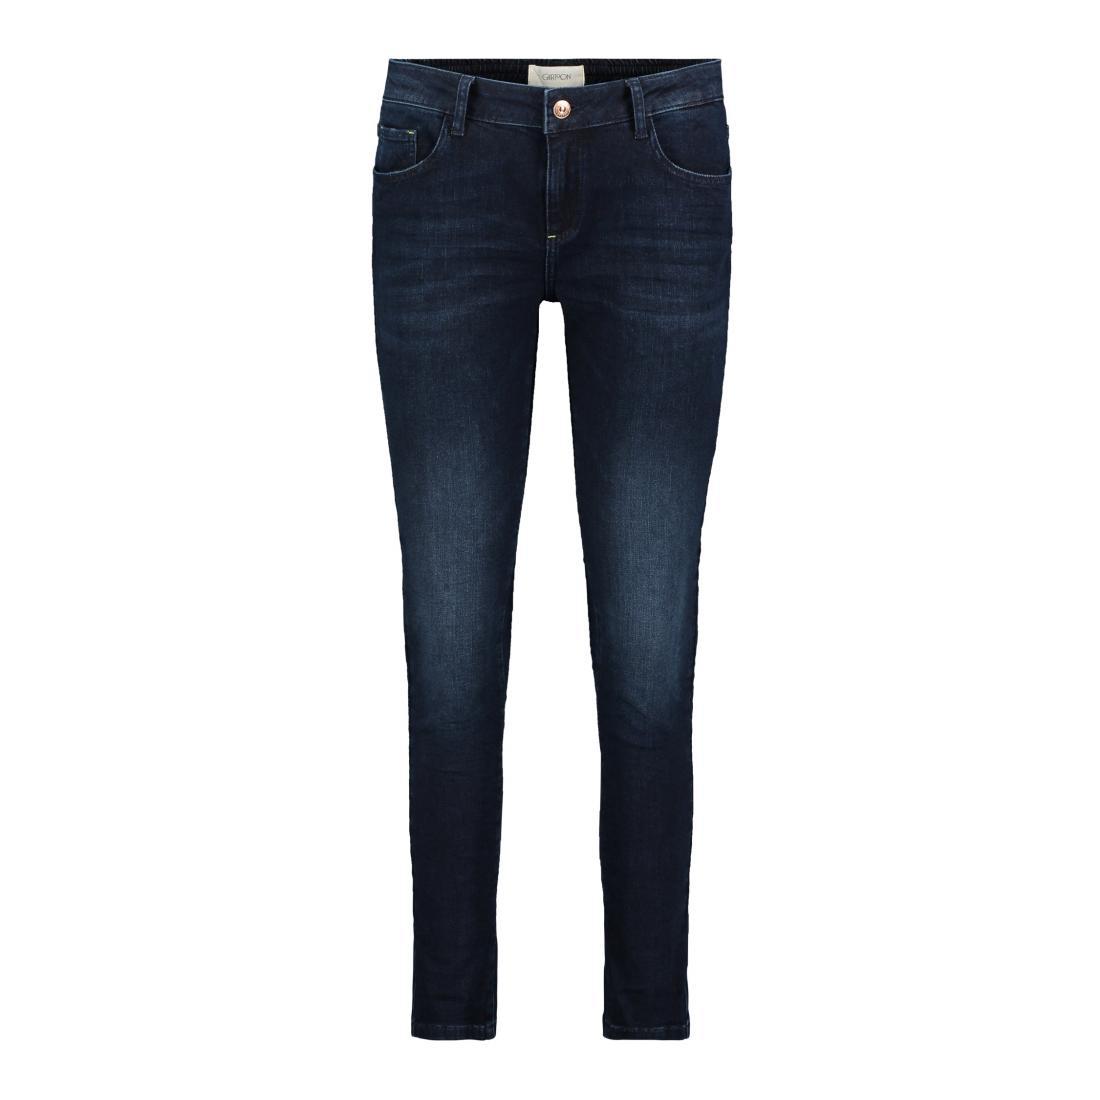 Cartoon Jeans Damen Hose Jeans 1/1 LAEnge